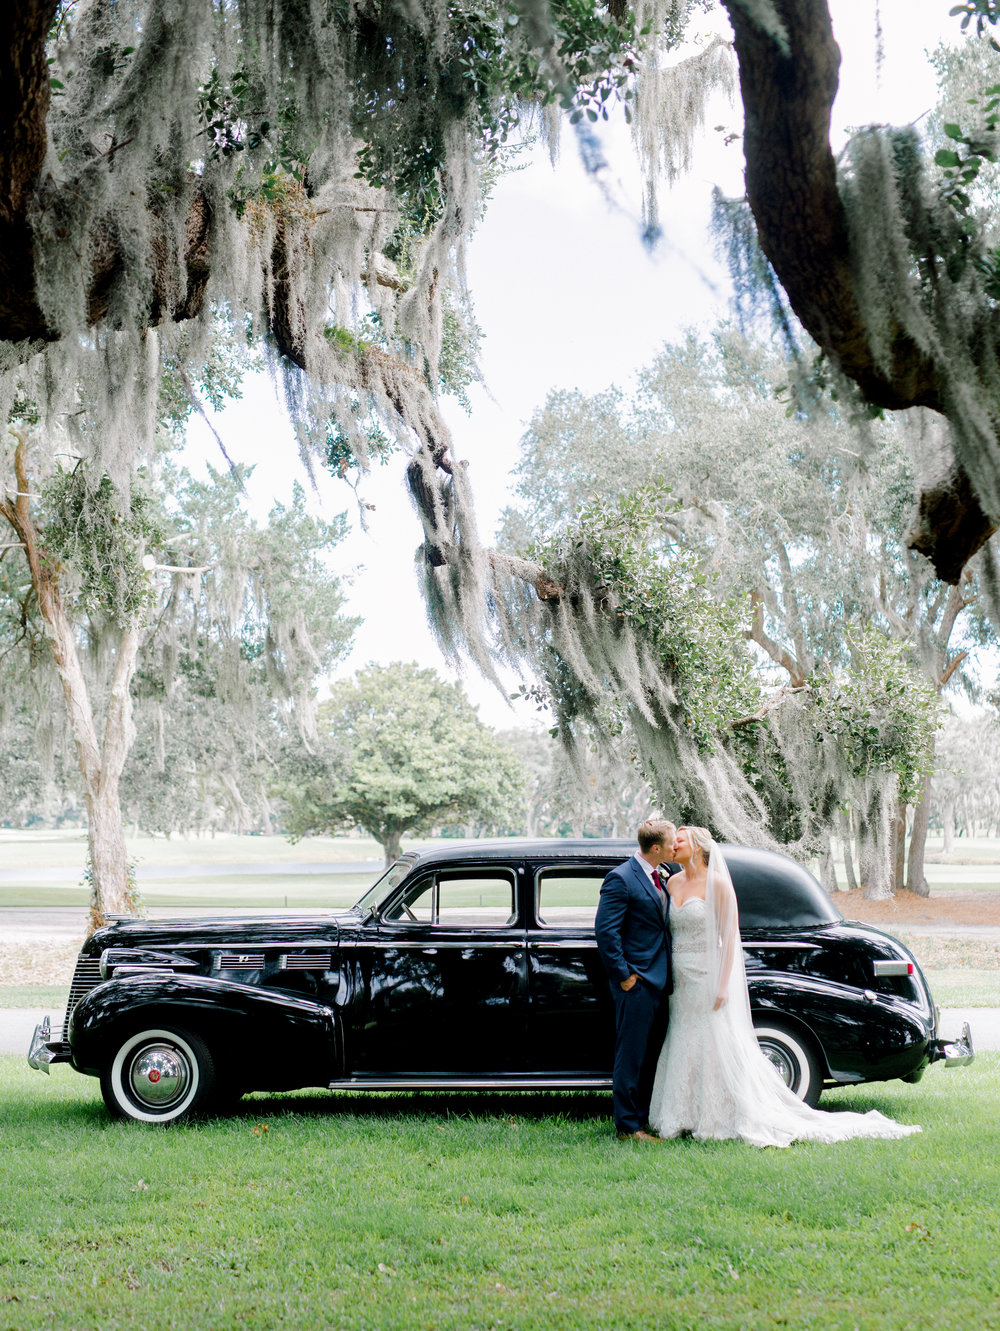 6saint_simons_island_wedding_megan_the_photographerIMG_9849A.jpg